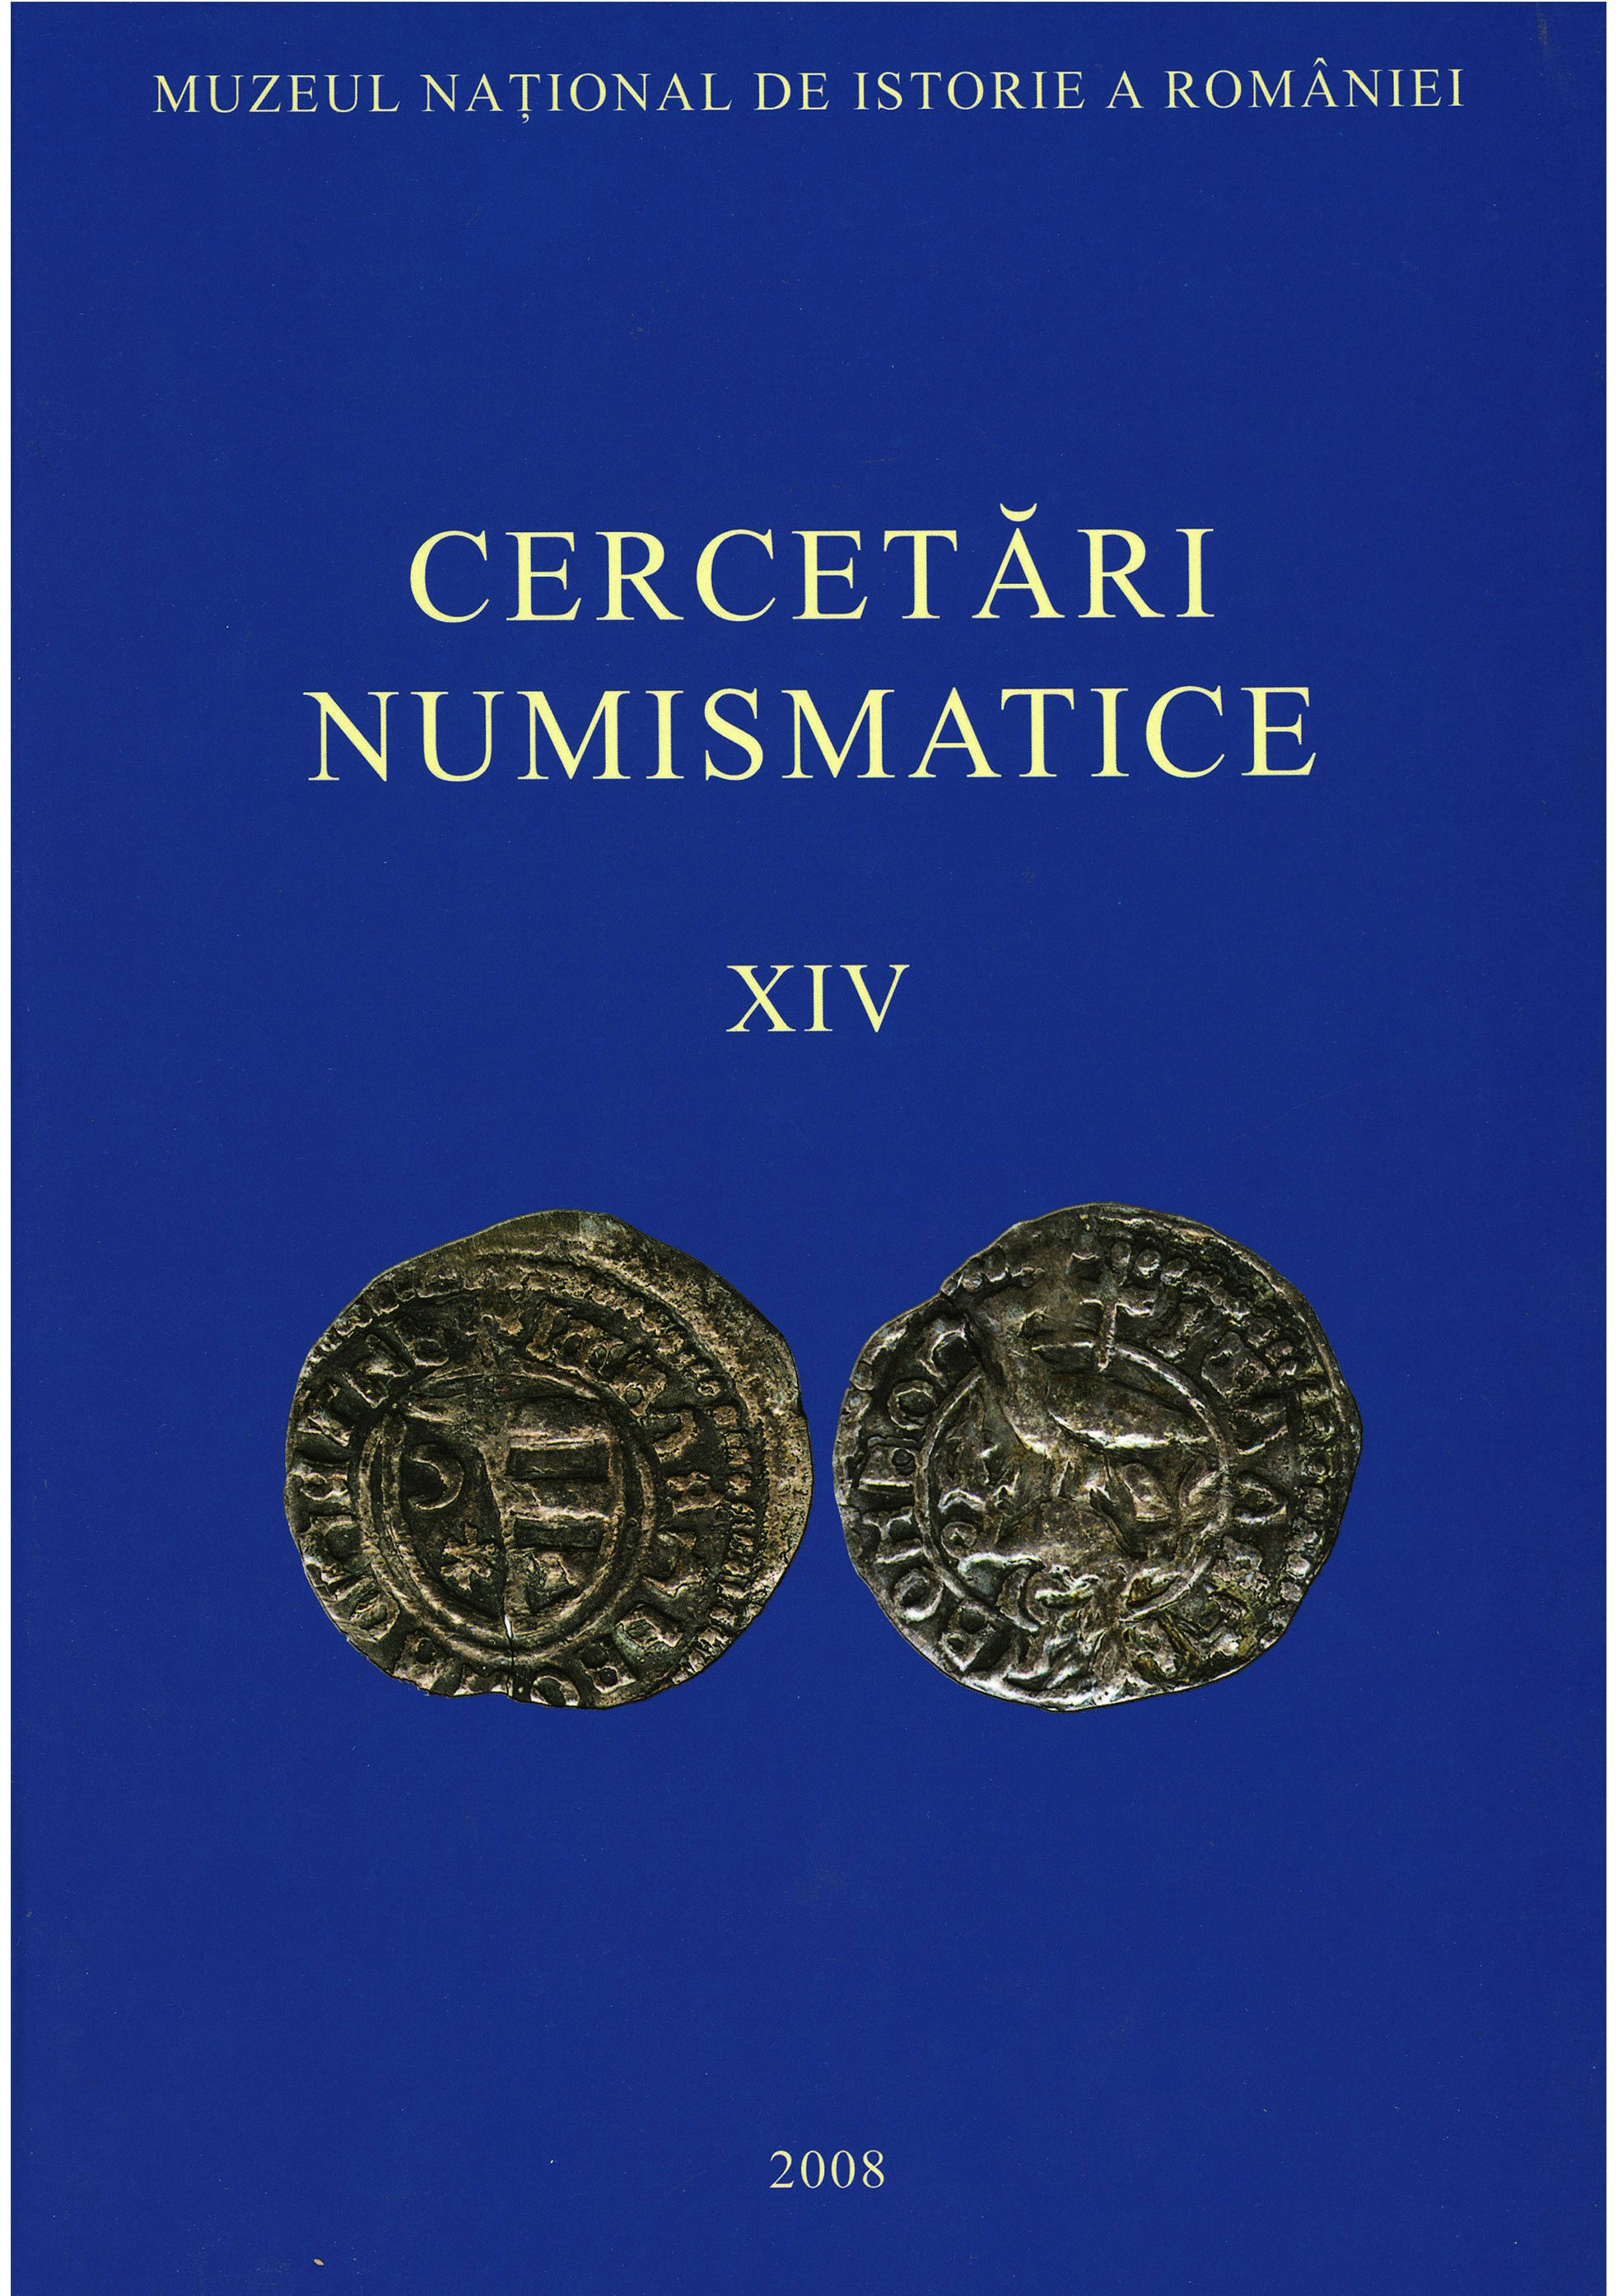 mnir_COP__0055_2008_Cercetari-numismatice-XIV_598pag